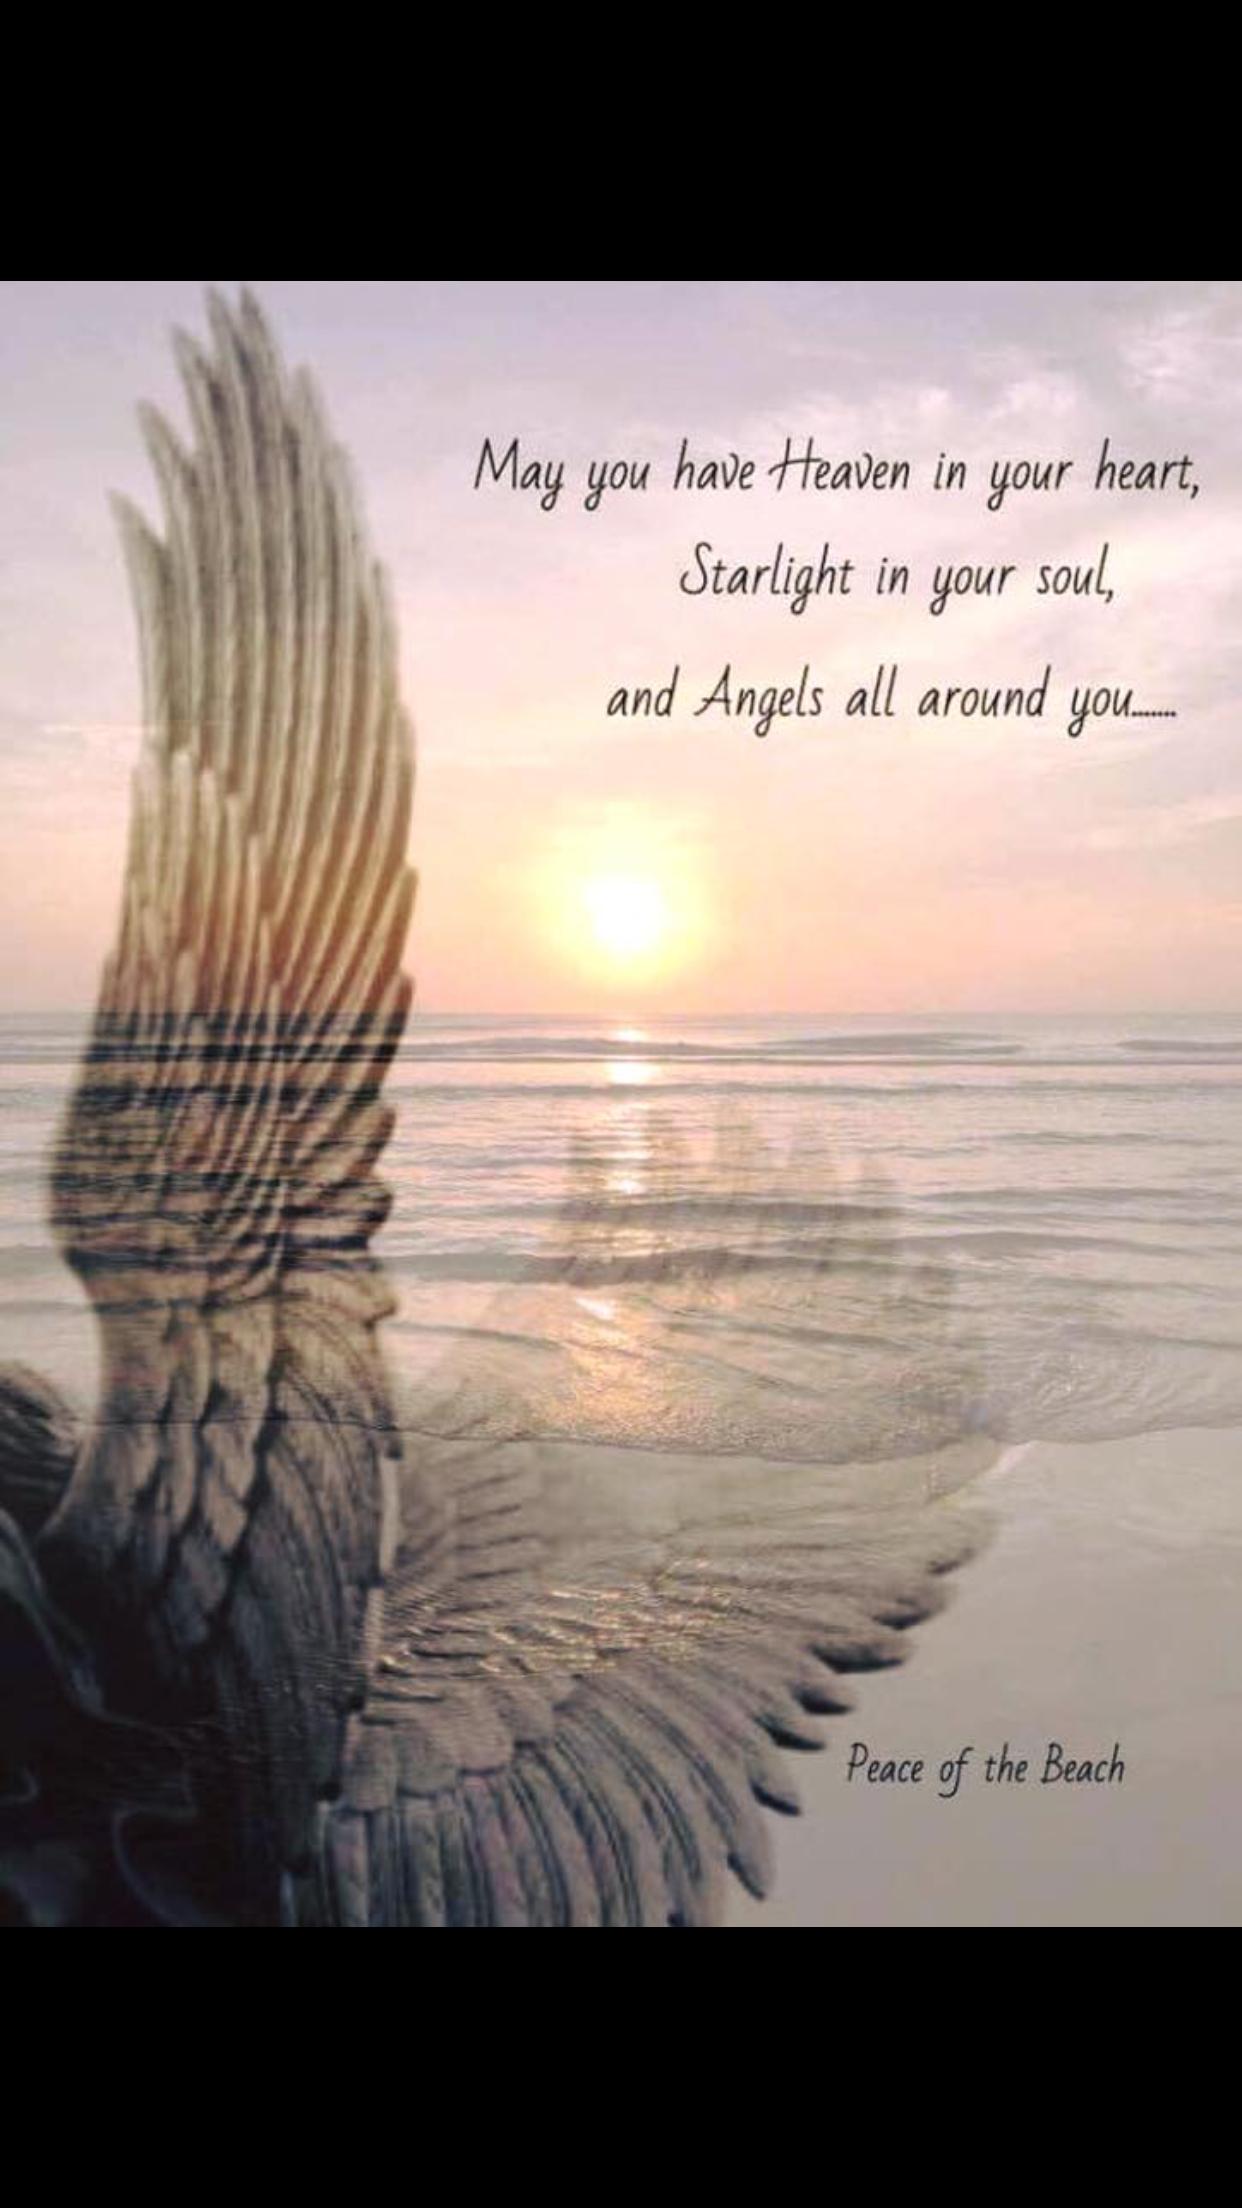 Citaten Over Engelen : Pin by sofie de wiele on papsie ik mis je engel citaten